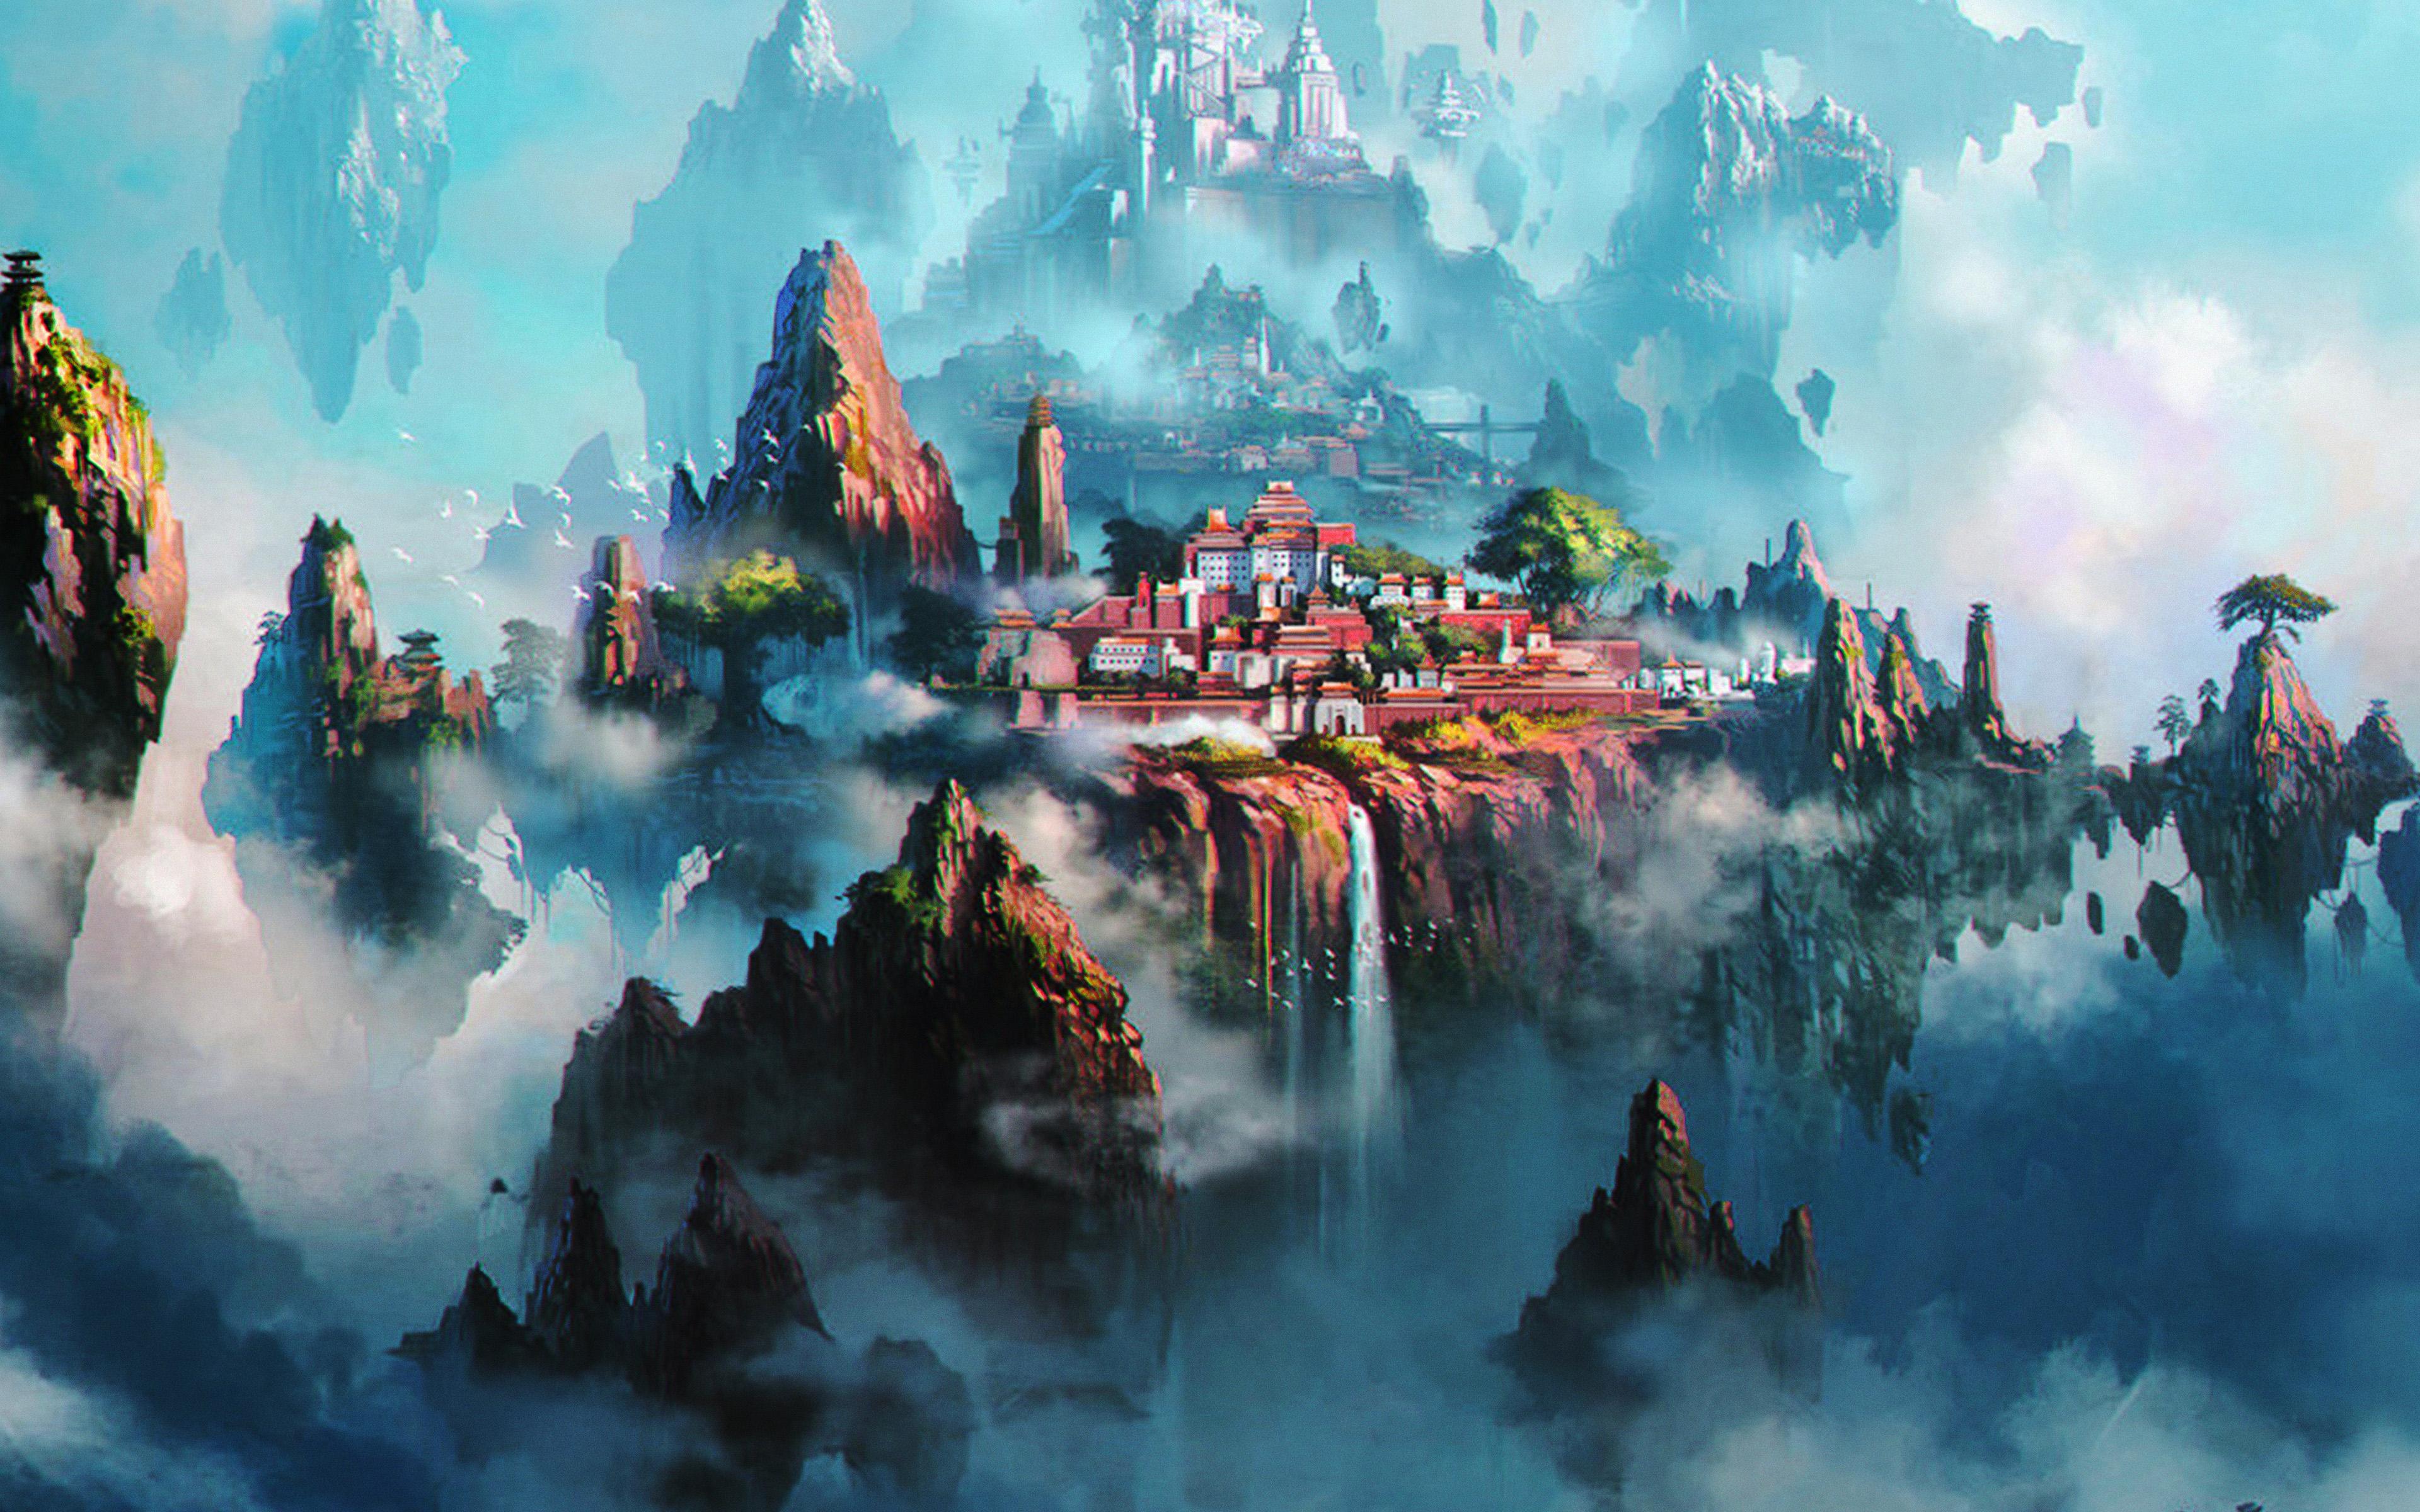 Av36 Cloud Town Fantasy Anime Liang Xing Illustration Art Green Wallpaper